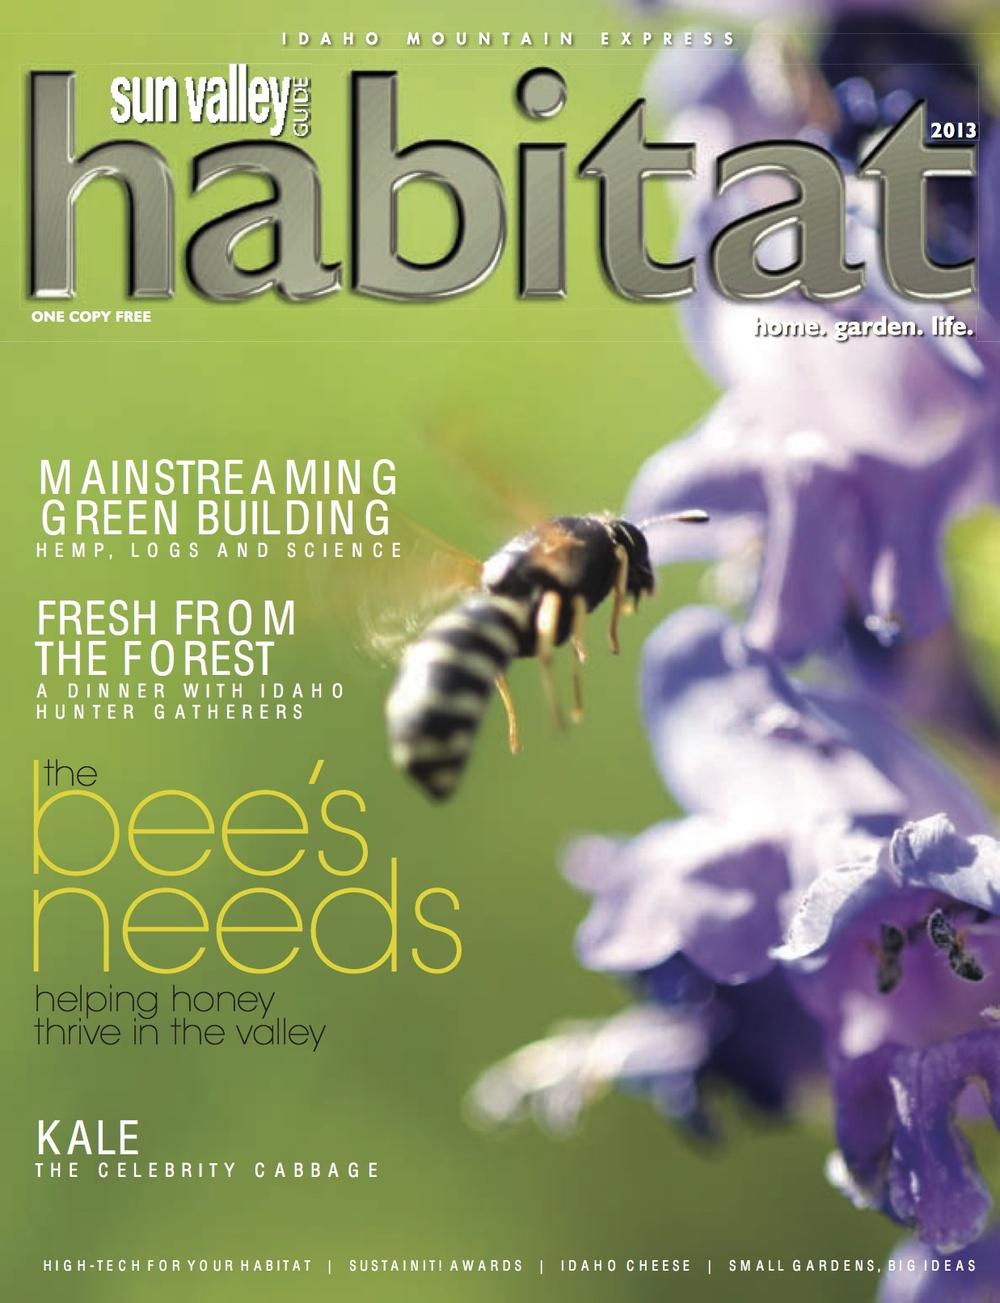 Habitat cover.jpg